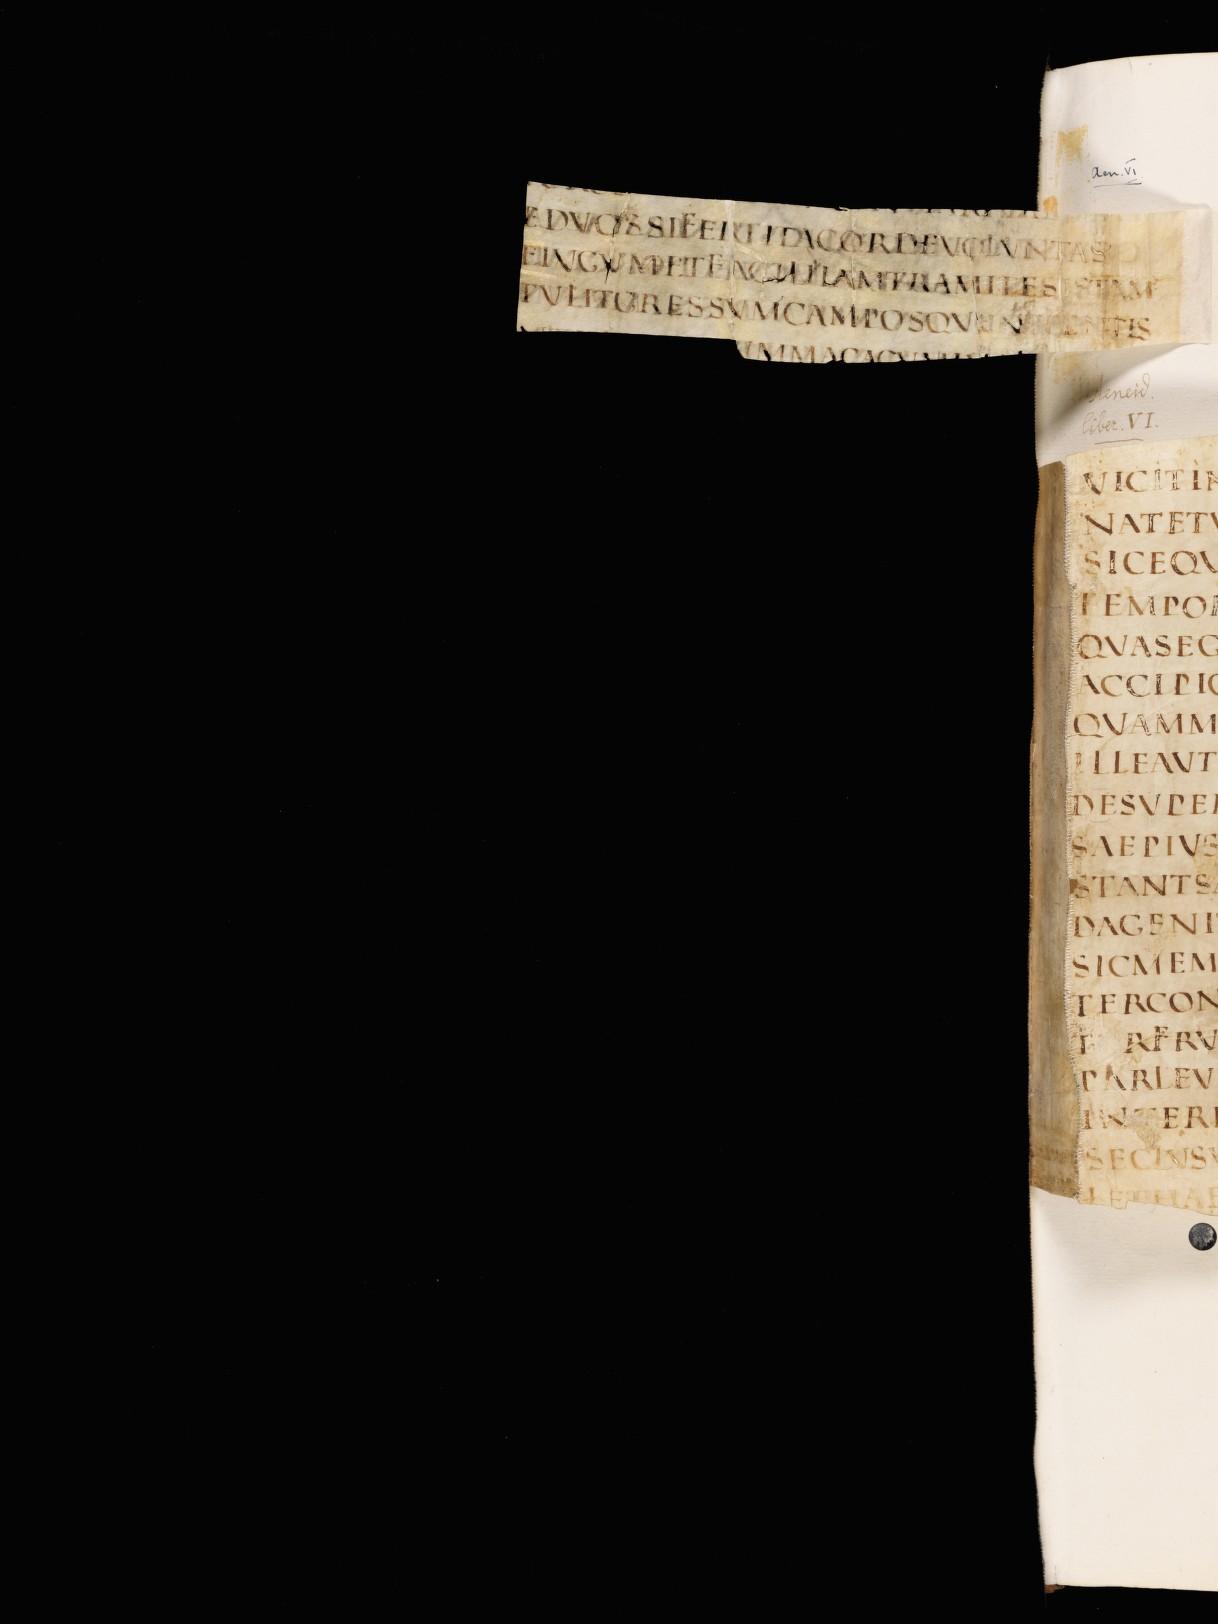 Cod. Sang. 1394, p. 32b